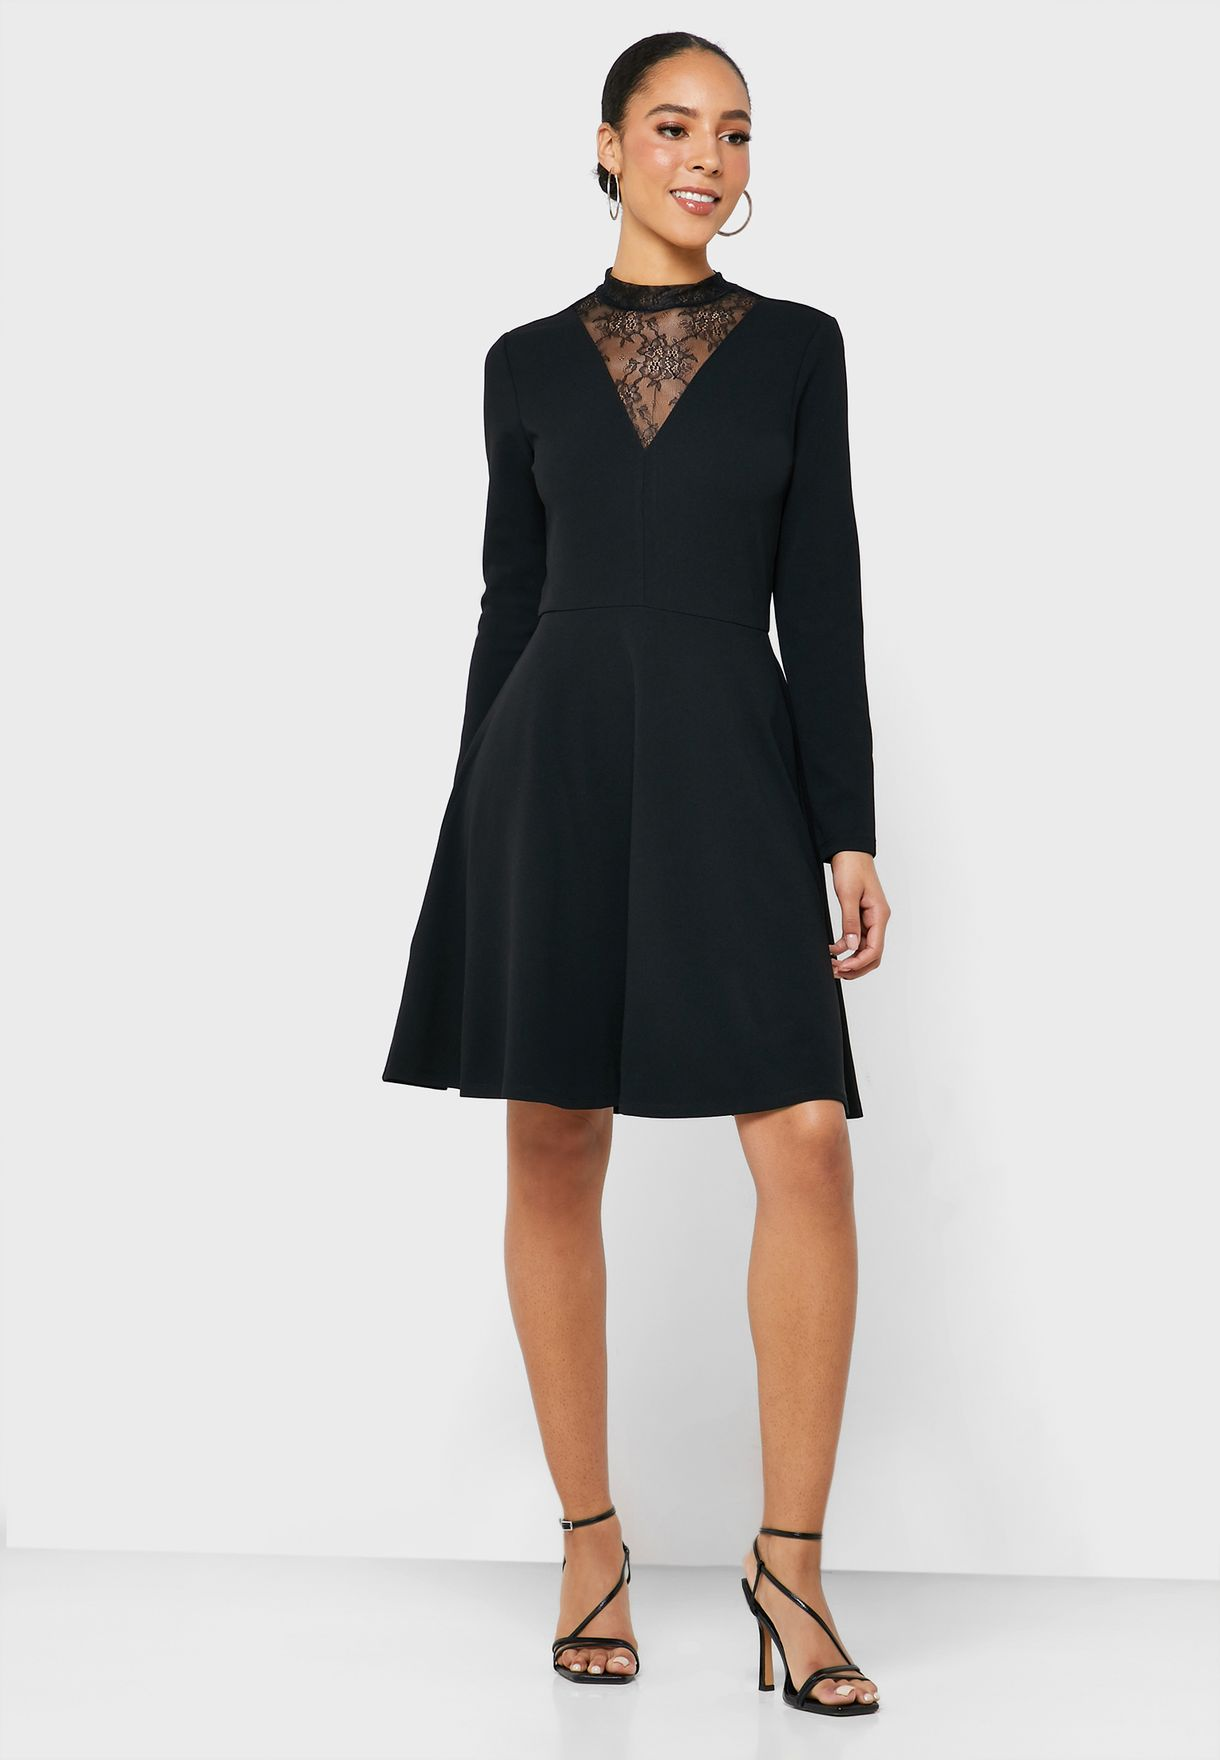 Lace Insert High Neck Dress